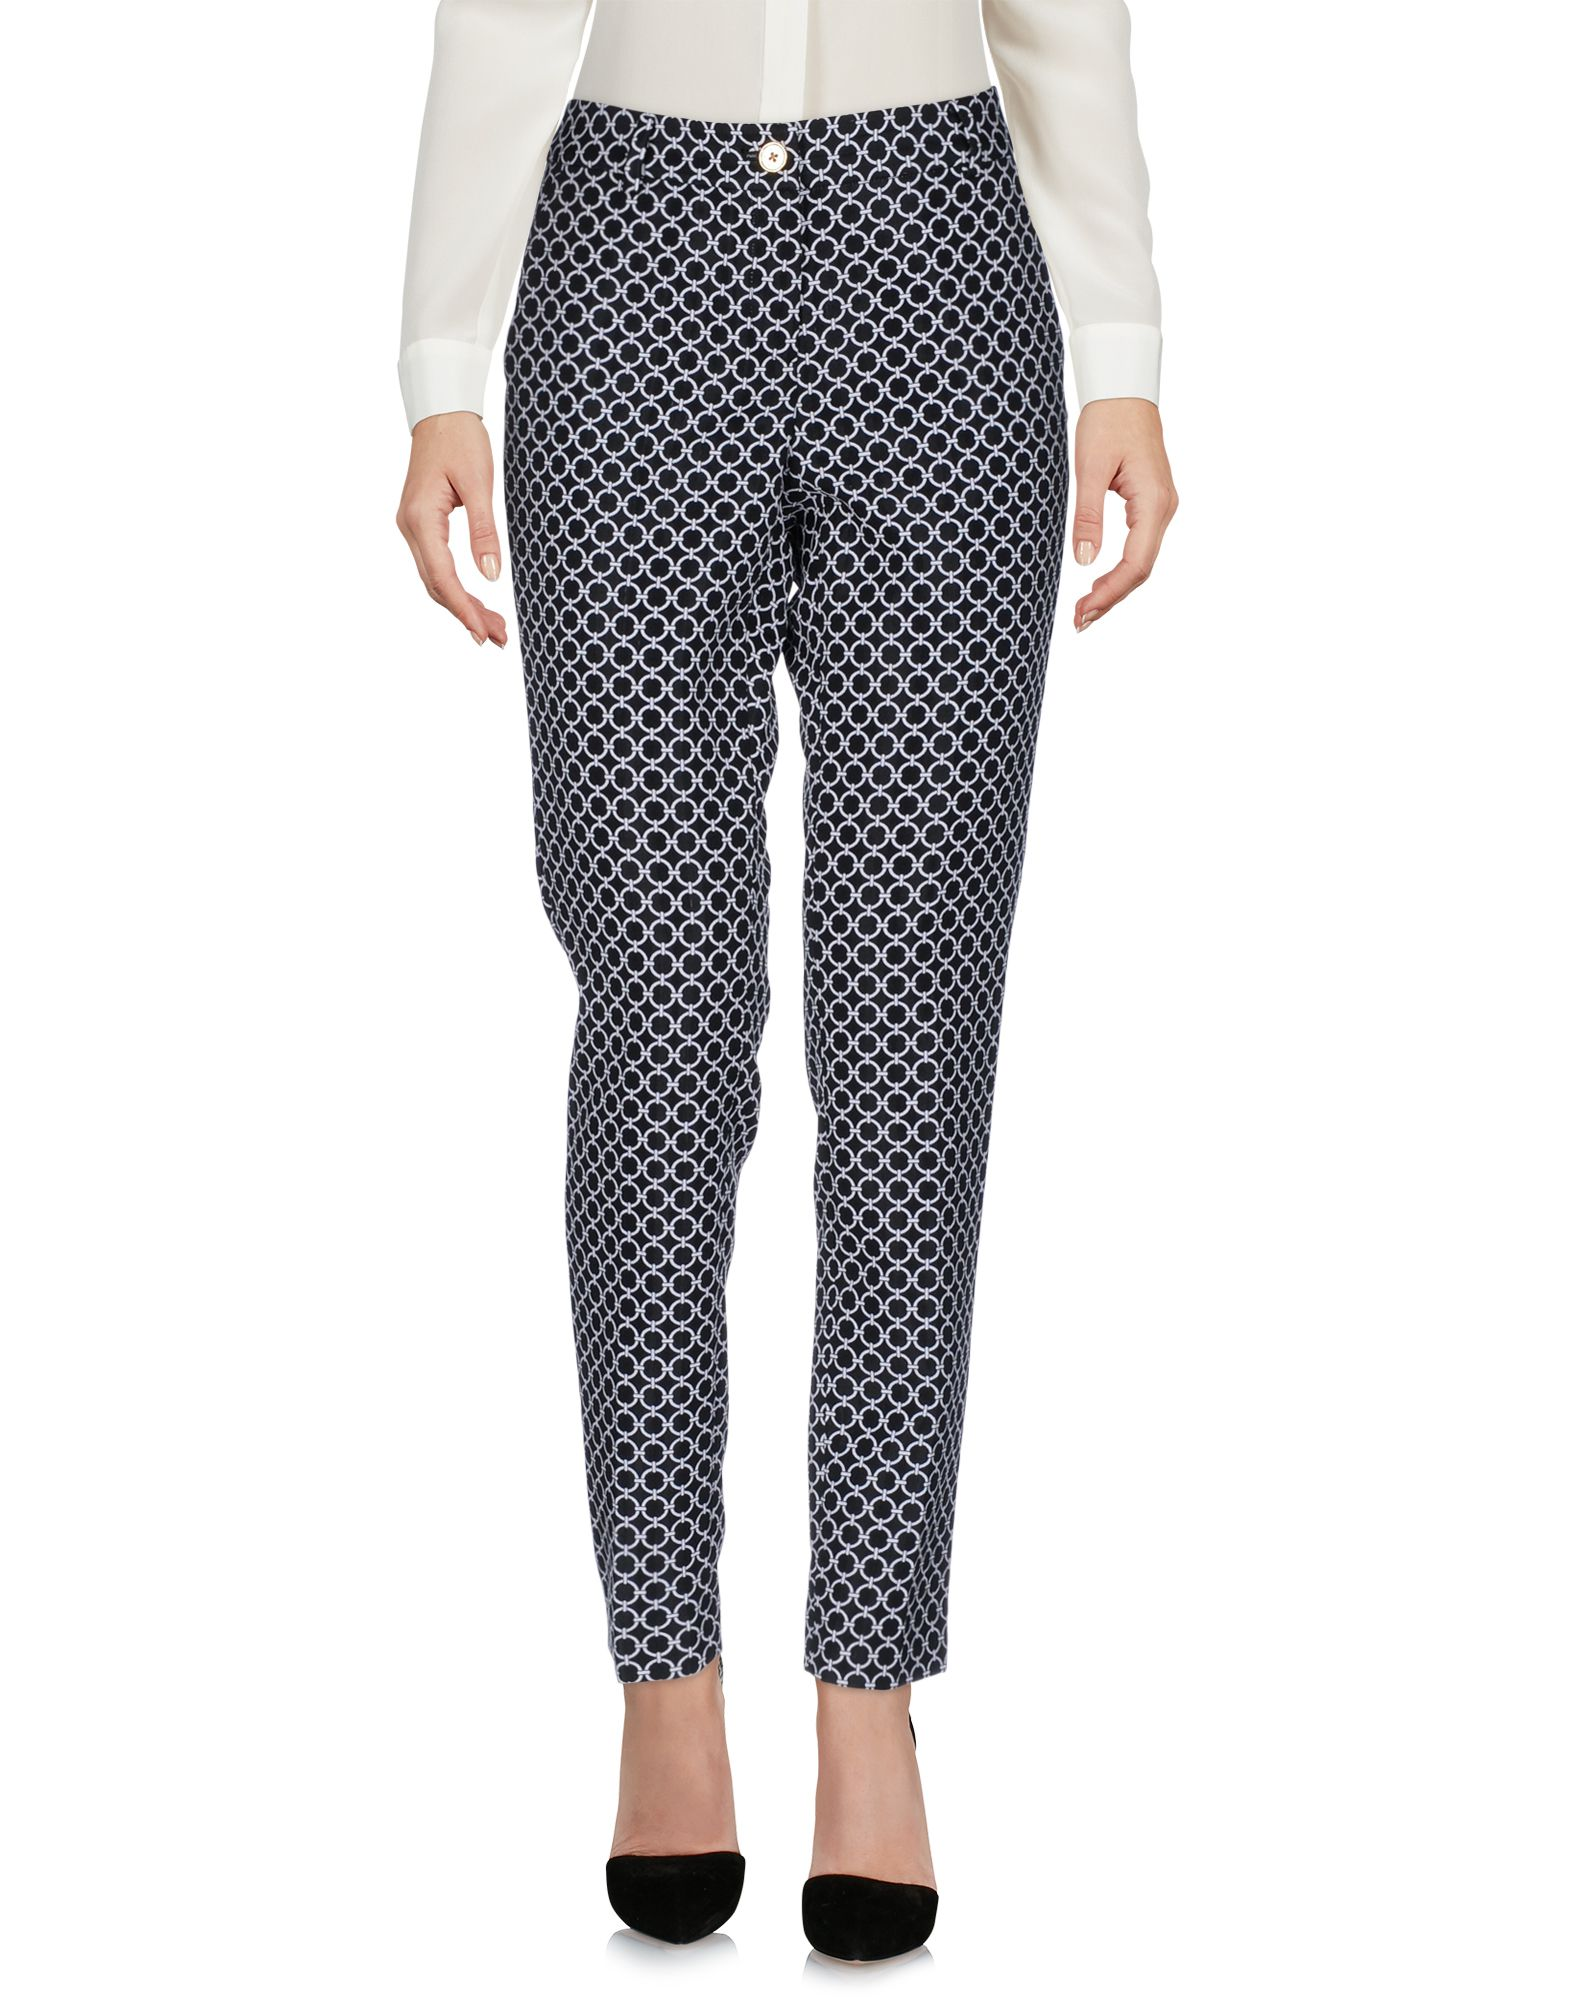 Pantalone Michael Michael Kors Donna - Acquista online su MArF2nhnH